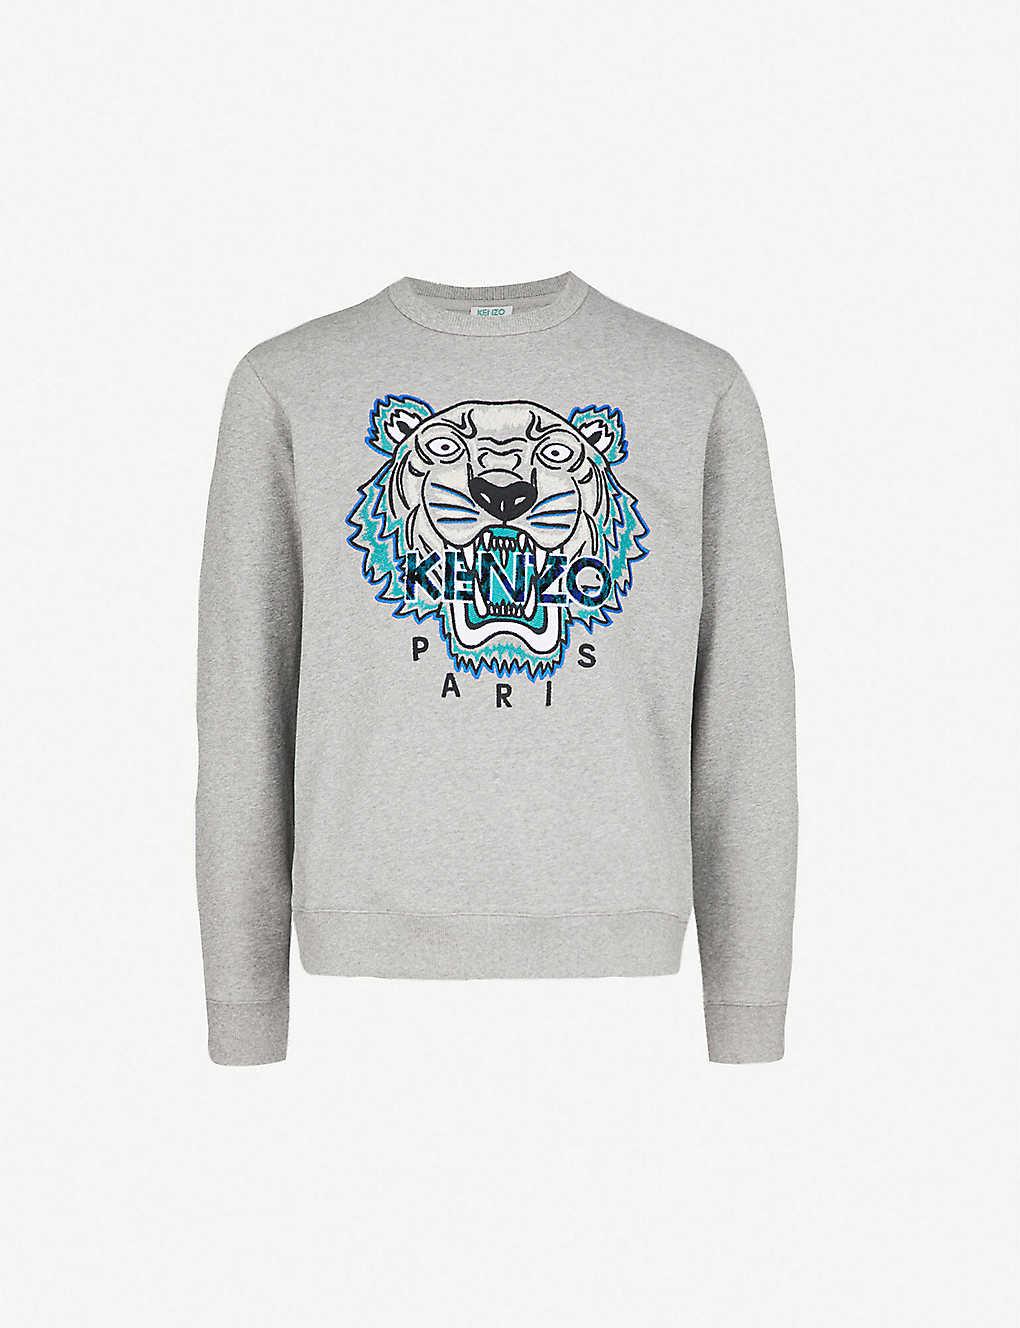 82f7a7ad82a KENZO - Tiger-embroidery cotton sweatshirt | Selfridges.com